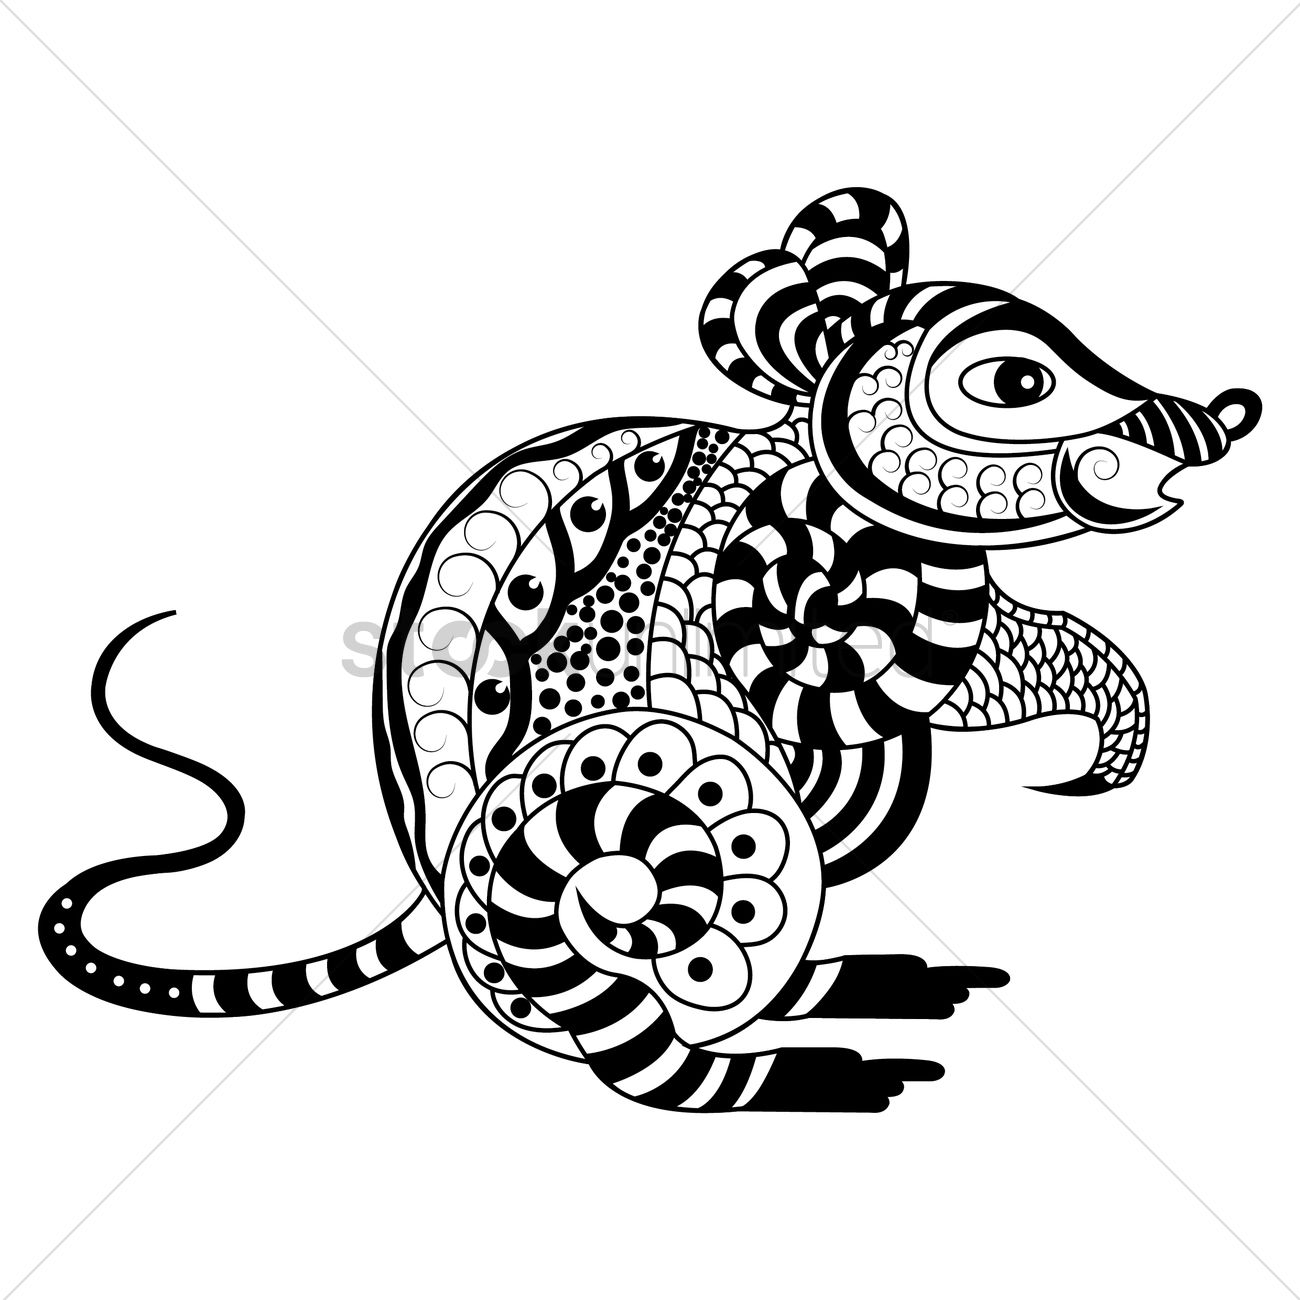 Line Art Rat : Decorative rat design vector image stockunlimited